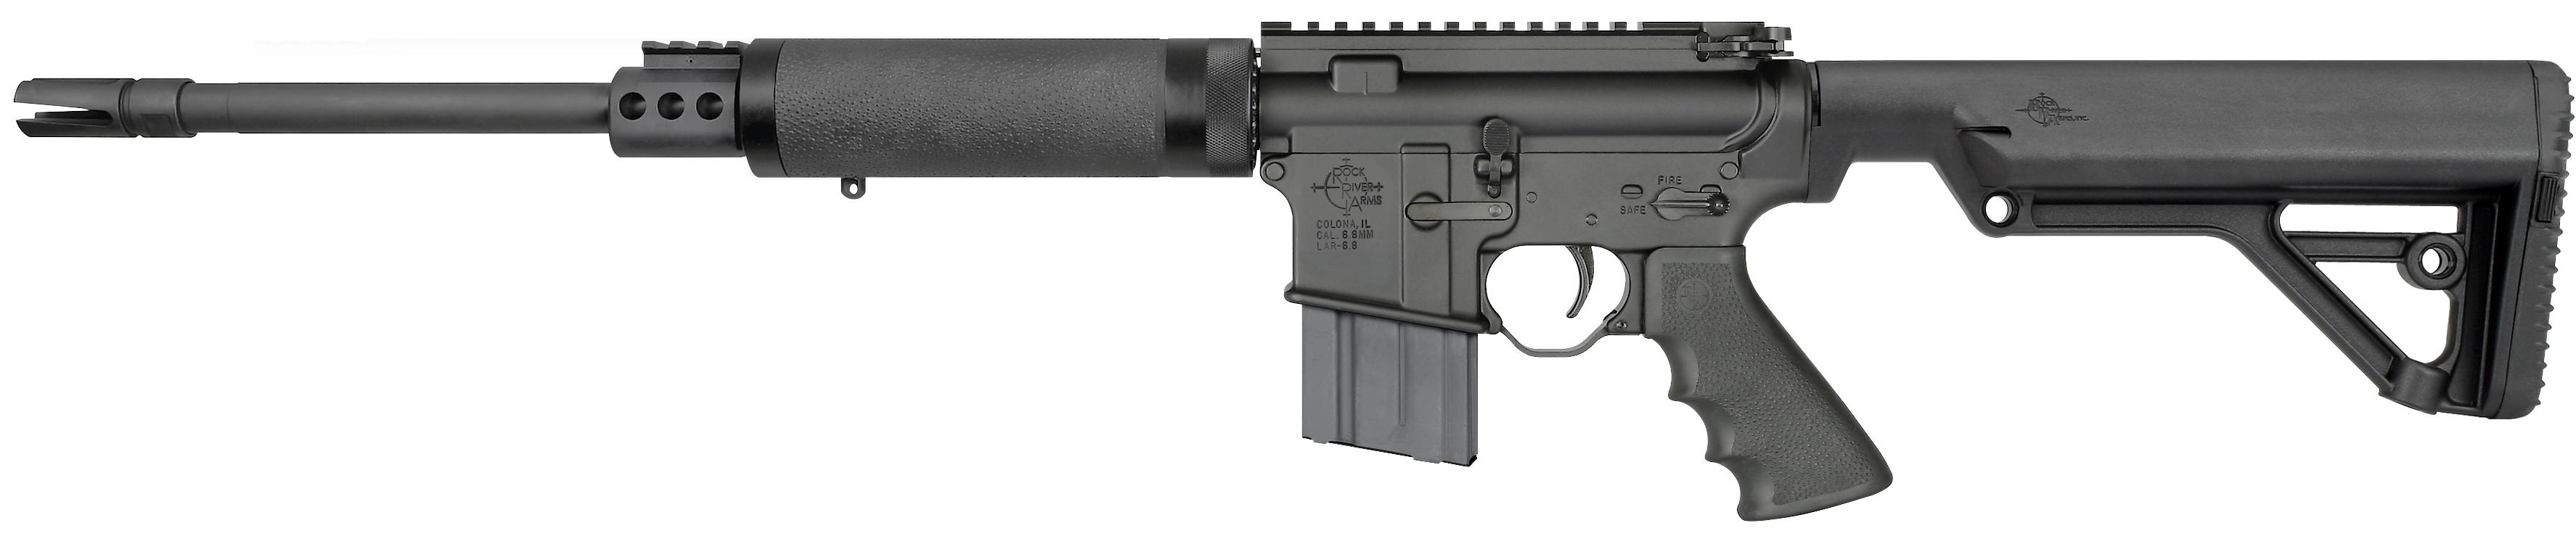 Coyote Carbine